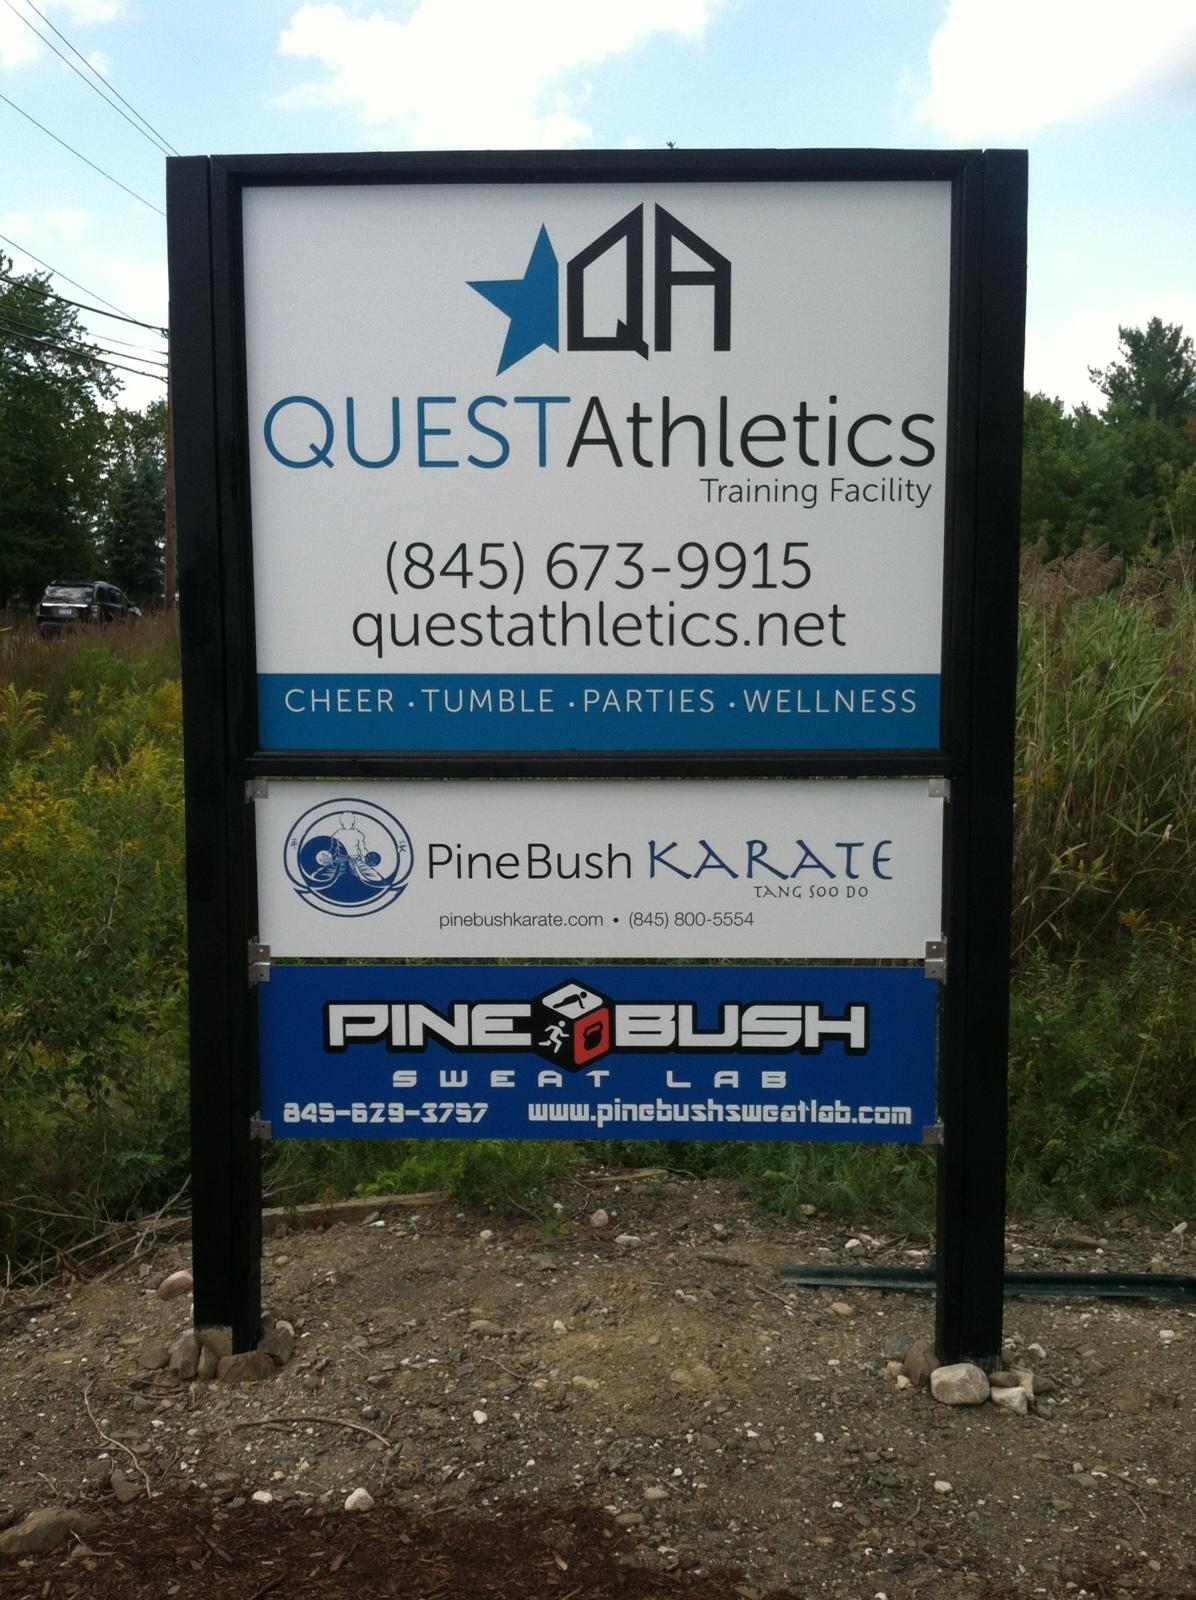 Quest Athletics.jpeg